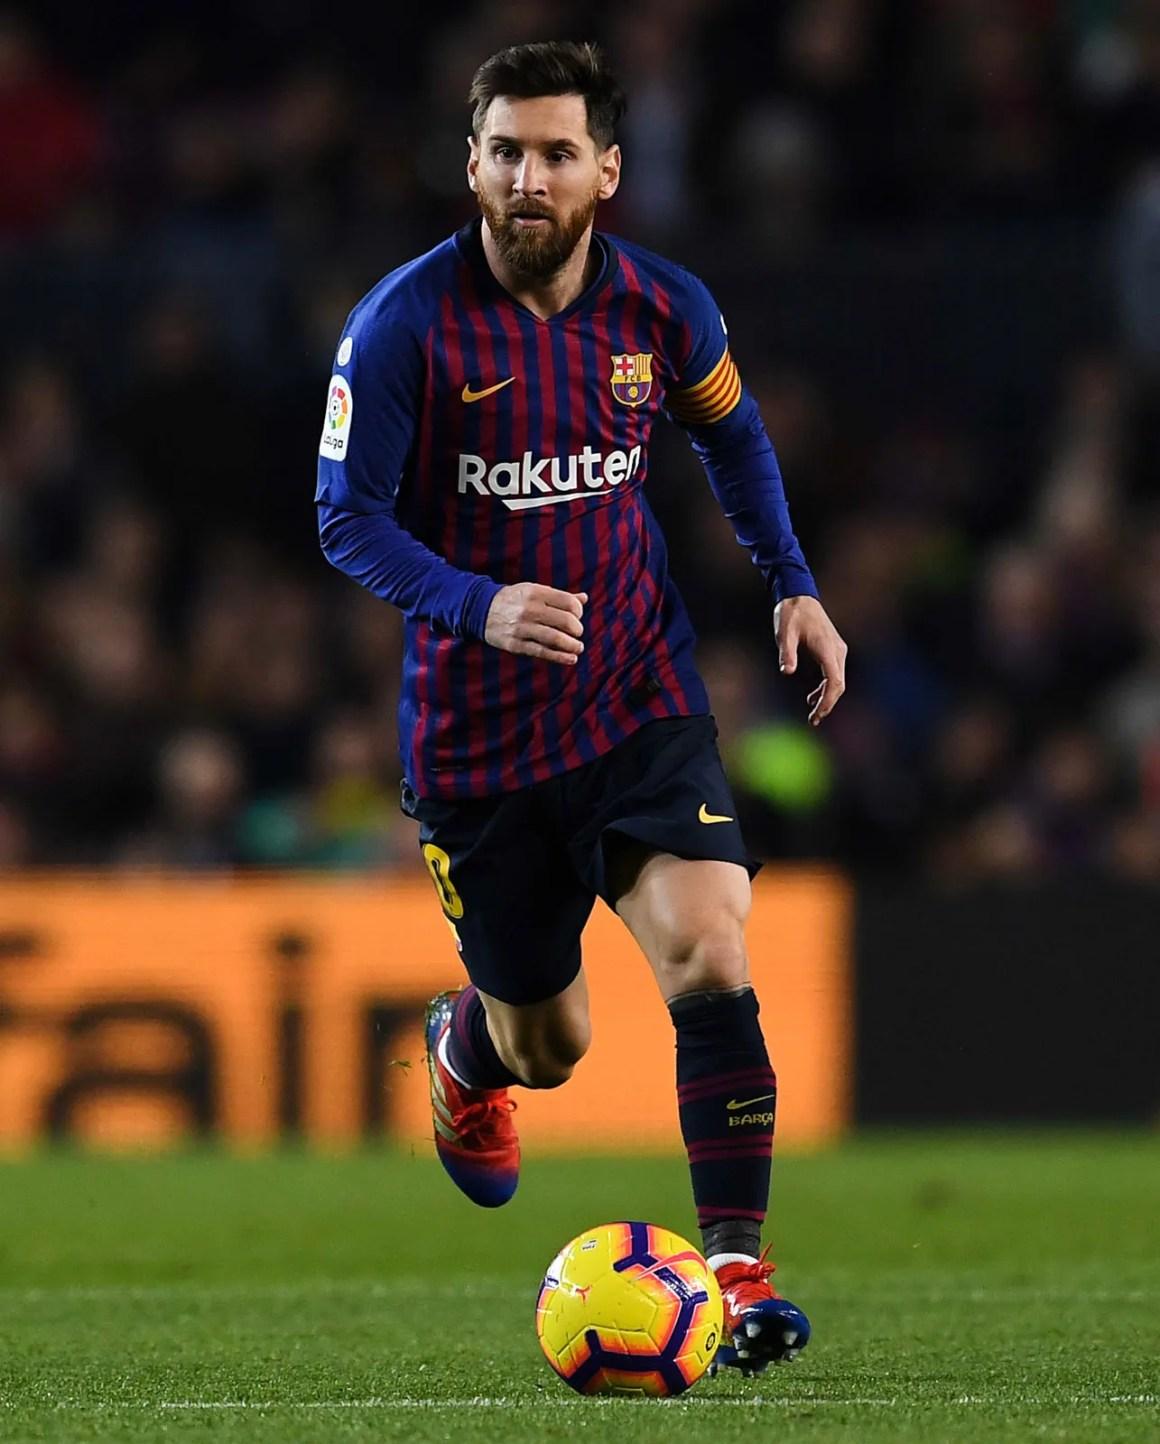 Lionel Messi | Biography & Facts | Britannica